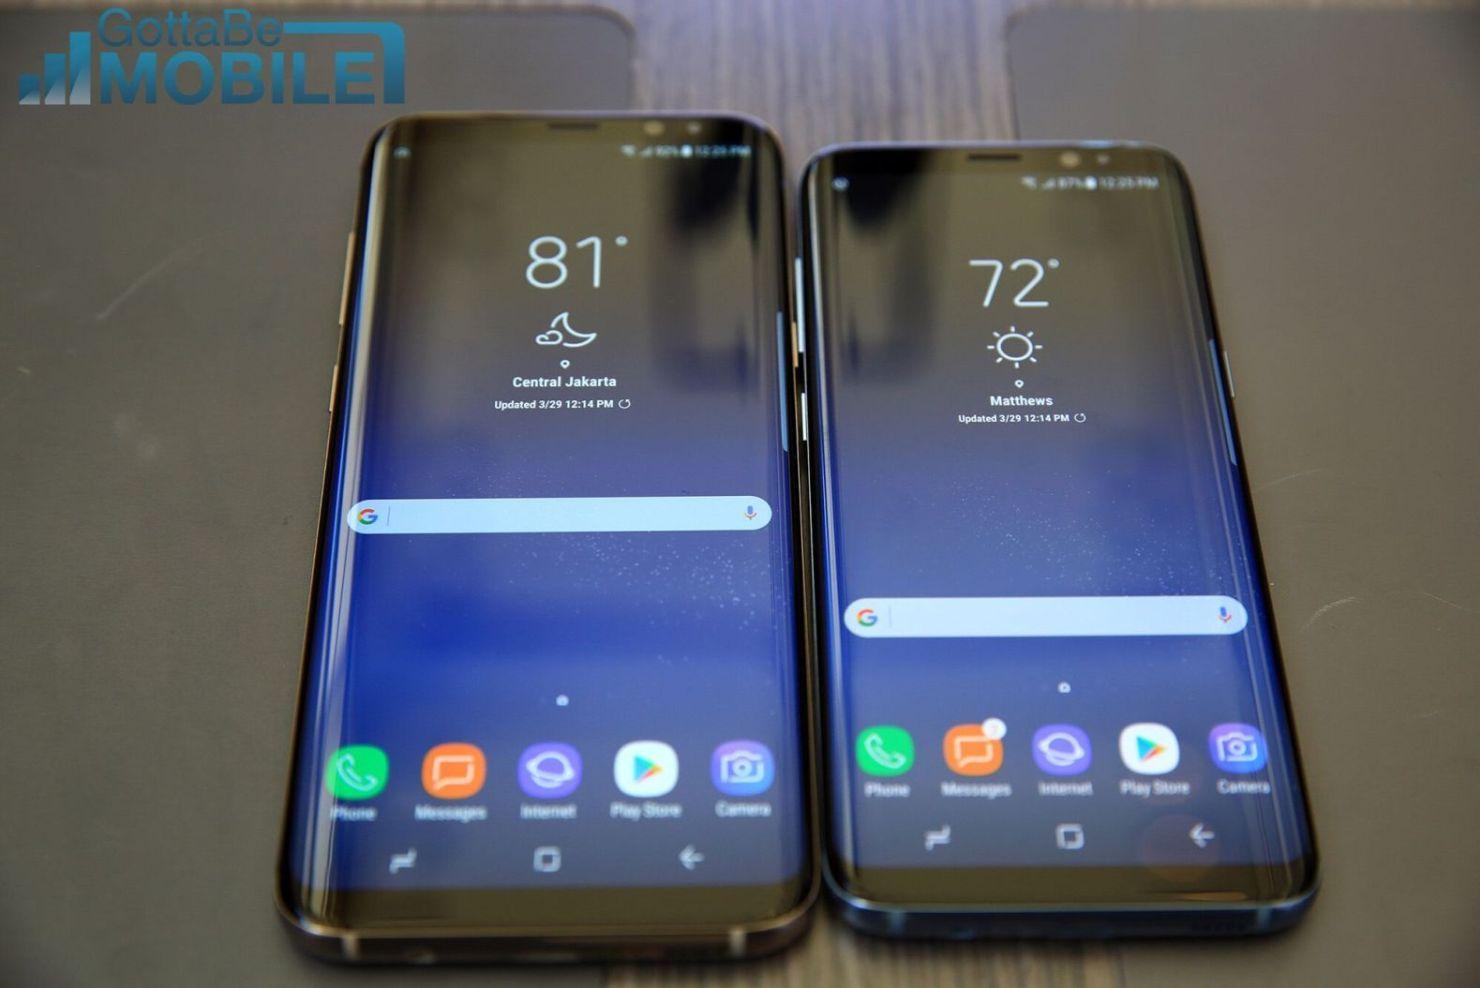 Galaxy S10 vs Galaxy S8: Worth the Upgrade?